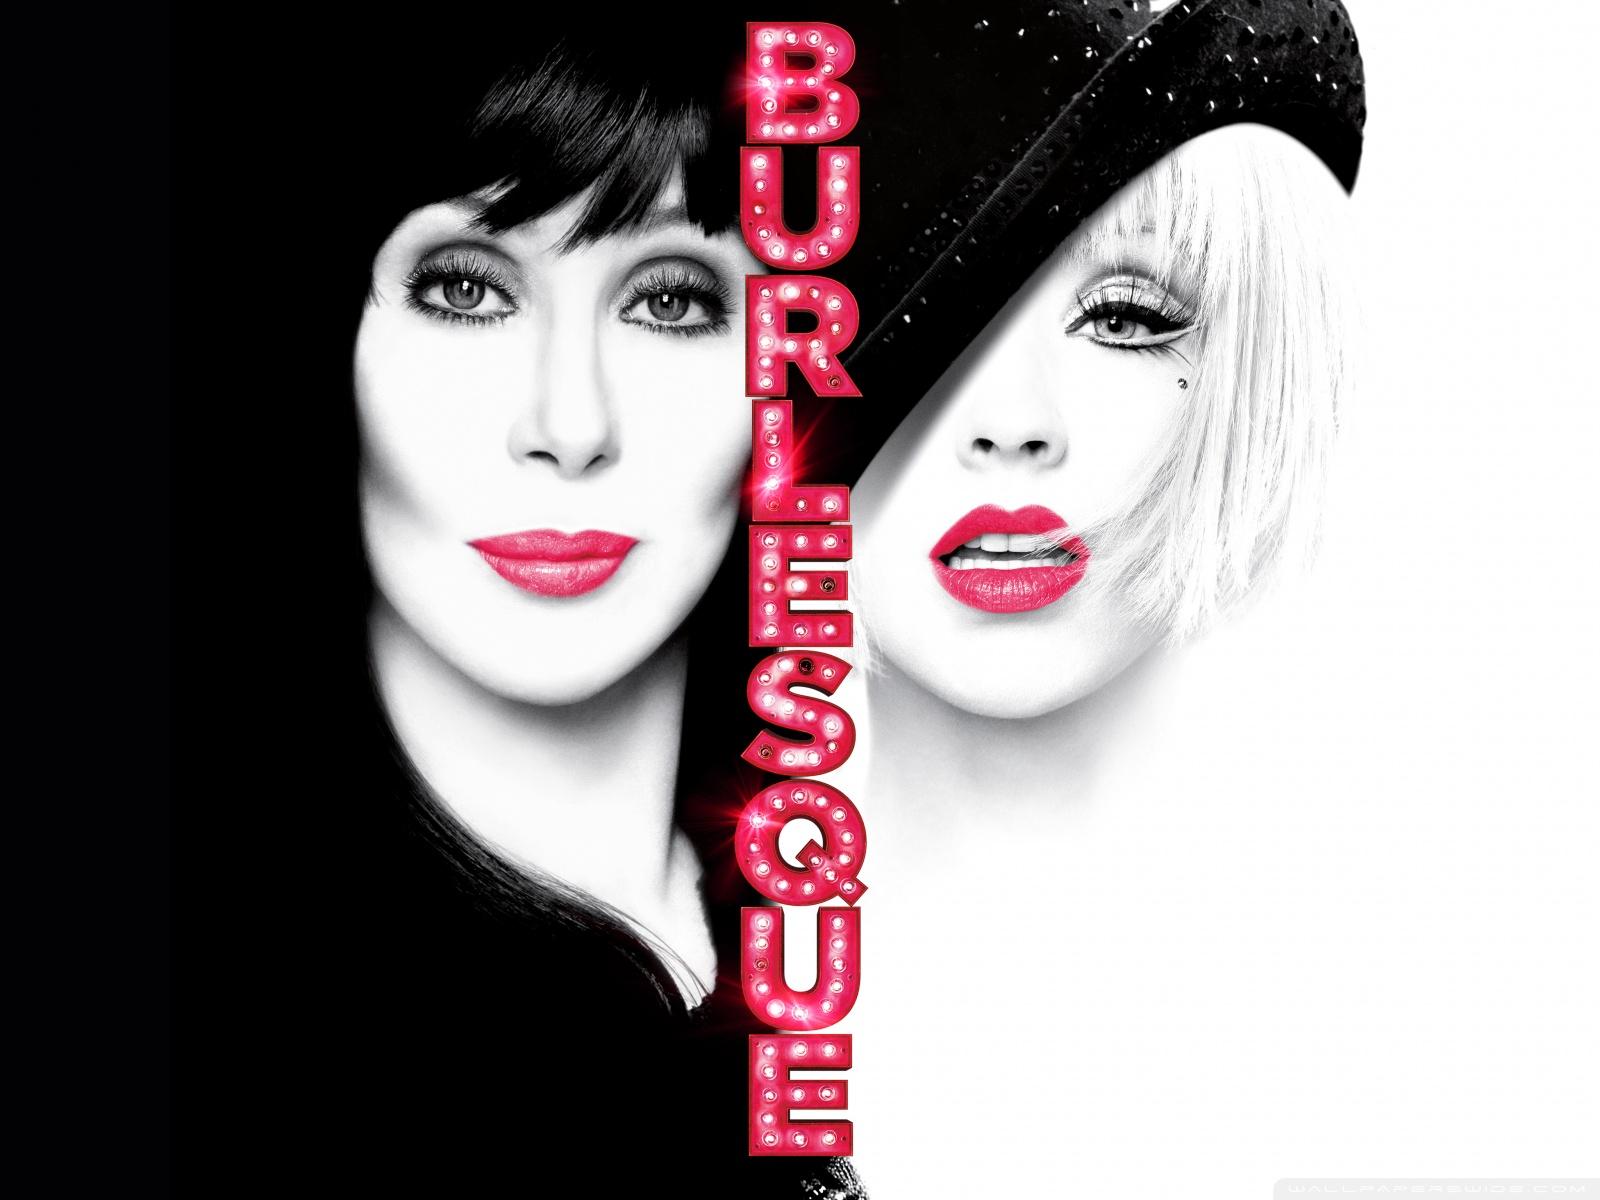 http://1.bp.blogspot.com/_NiSBYu4qE7w/TUU_r19V0cI/AAAAAAAAAH0/jFiC0PKbE8E/s1600/burlesque___christina_aguilera__cher-1600x1200.jpg